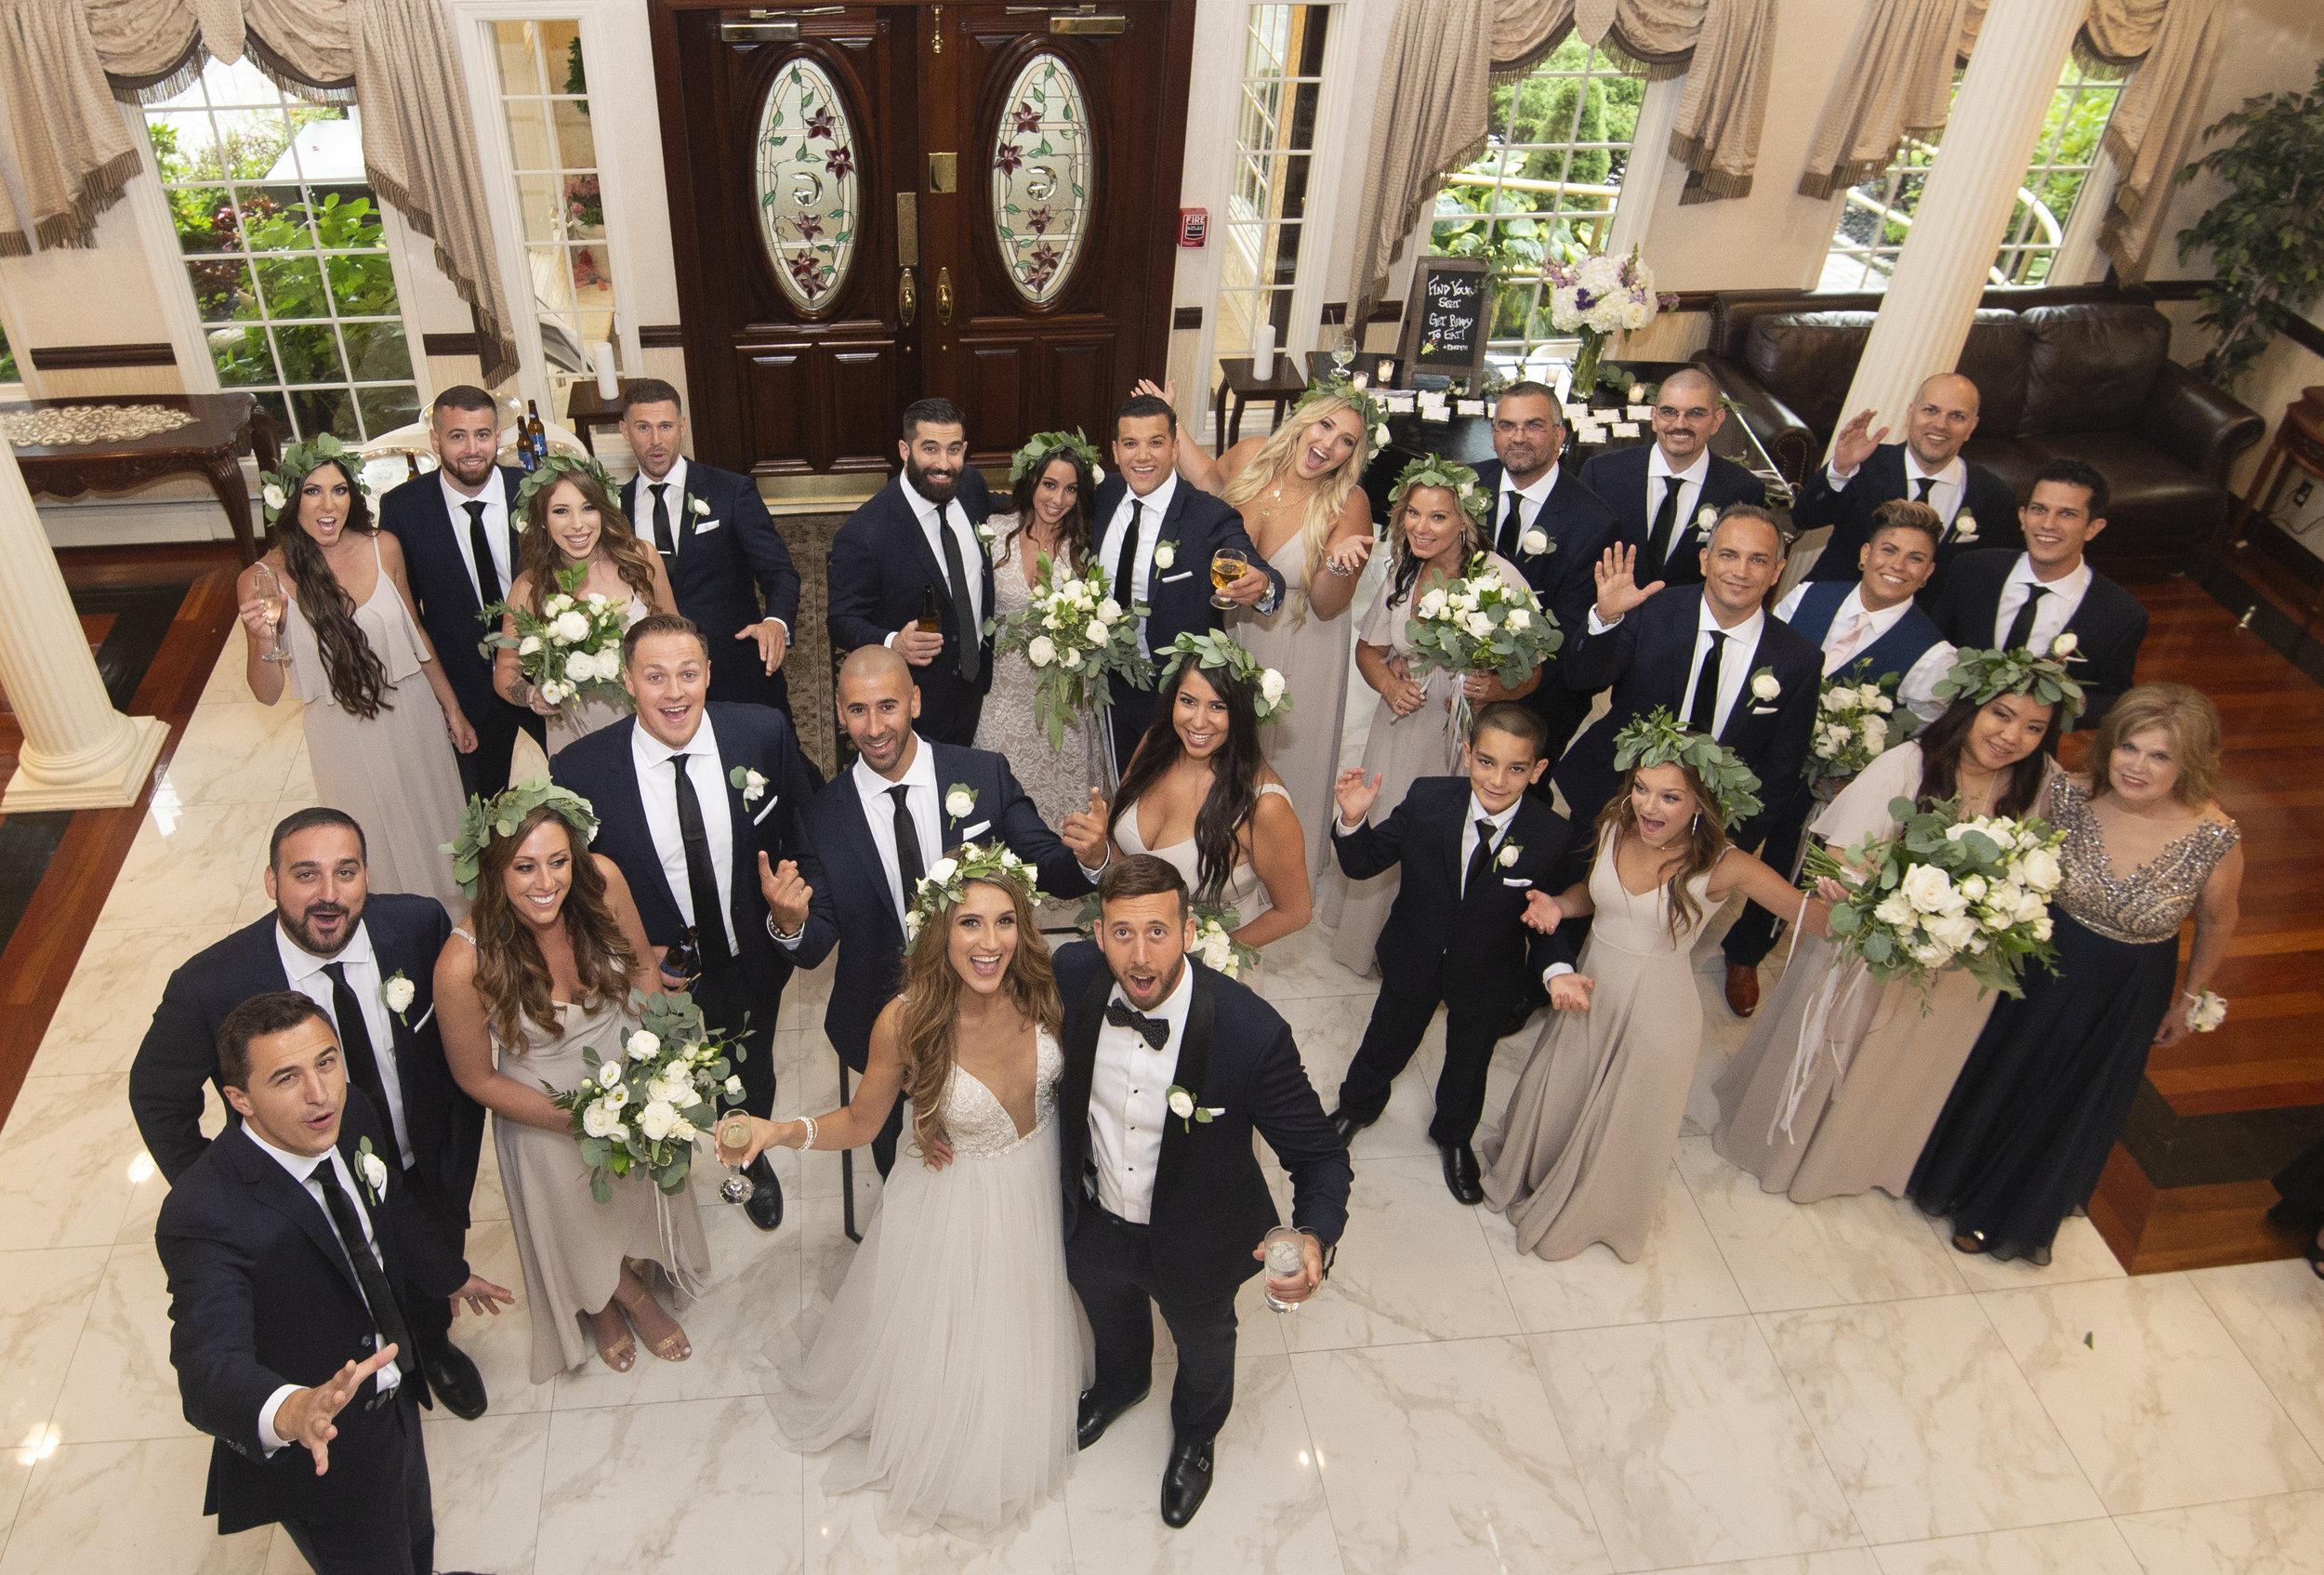 Sheri & Keith wedding at Giorgios, NY by Unveiled-Weddings.com